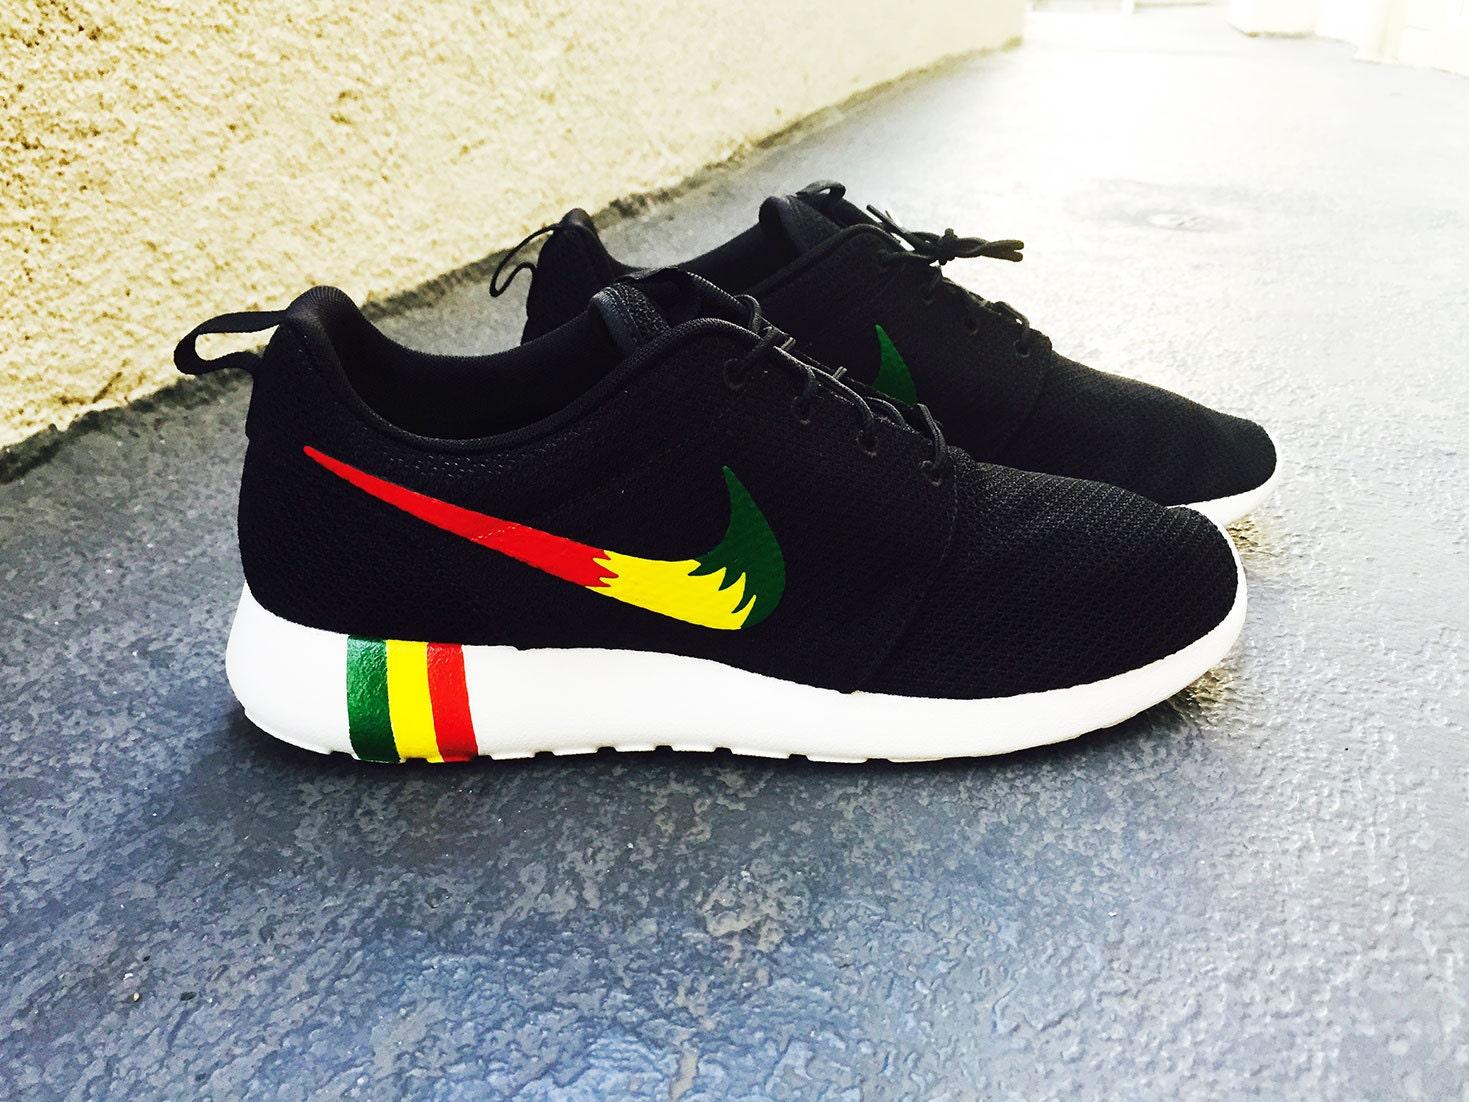 Rasta Shoes For Women